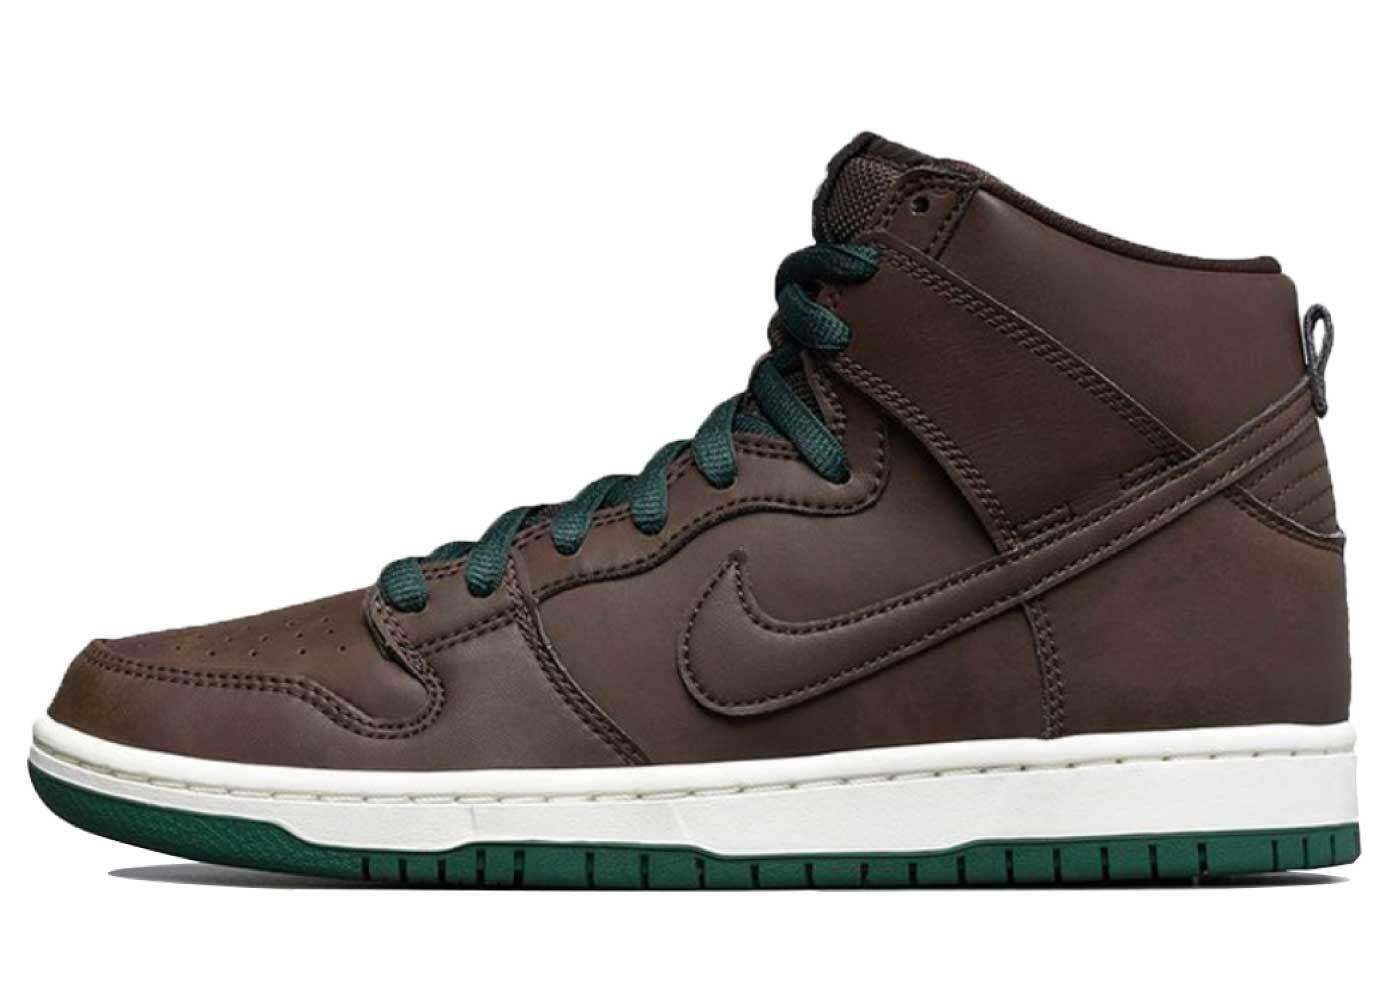 Nike SB Dunk High Pro Baroque Brownの写真